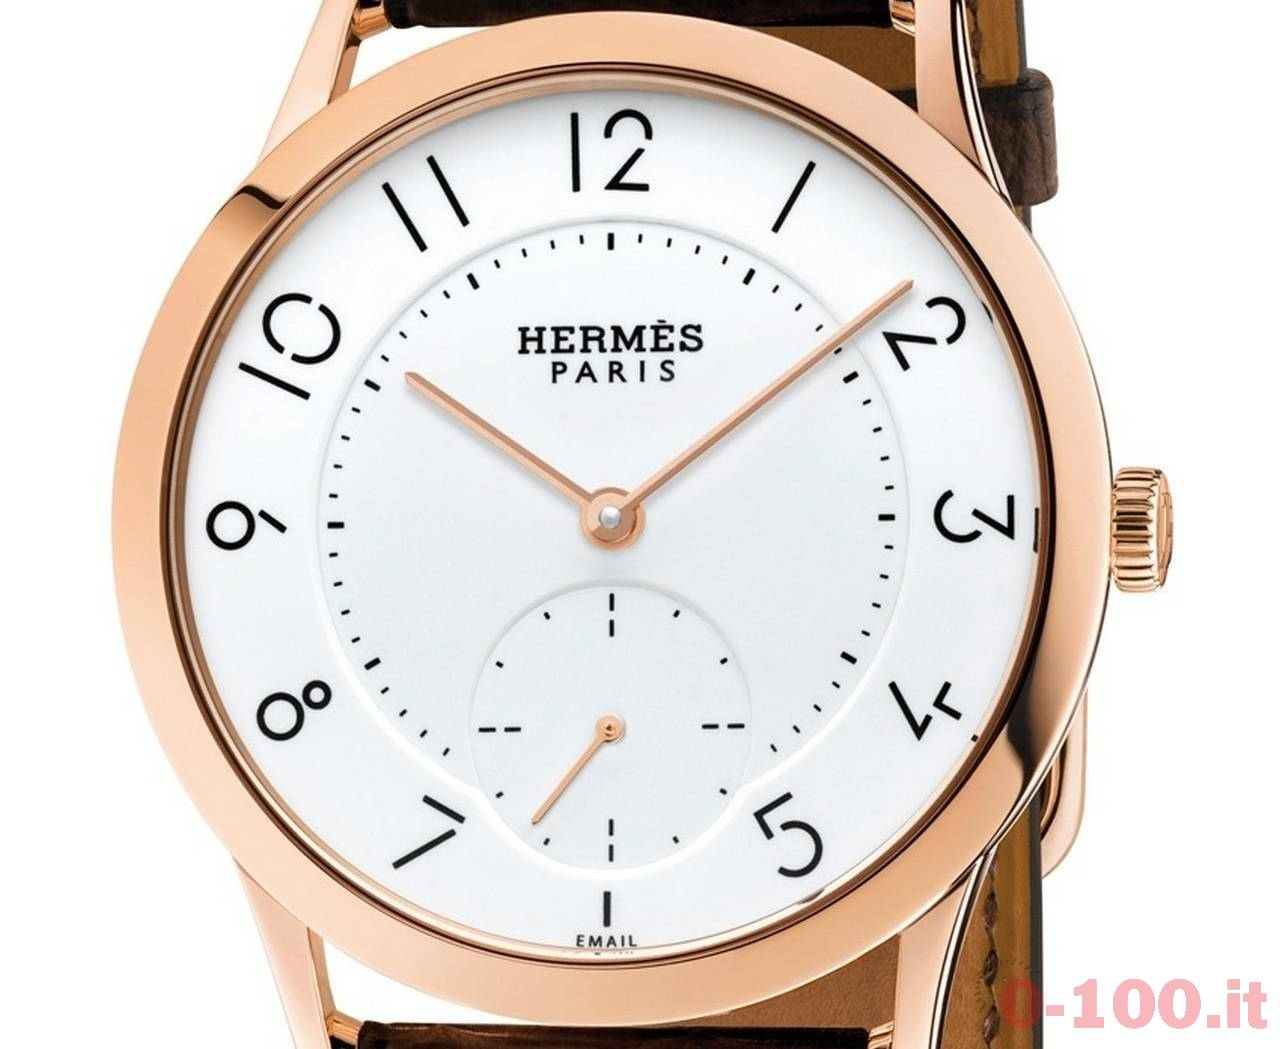 baselworld-2016-hermes-slim-dhermes-email-grand-feu-prezzo-price_0-1003